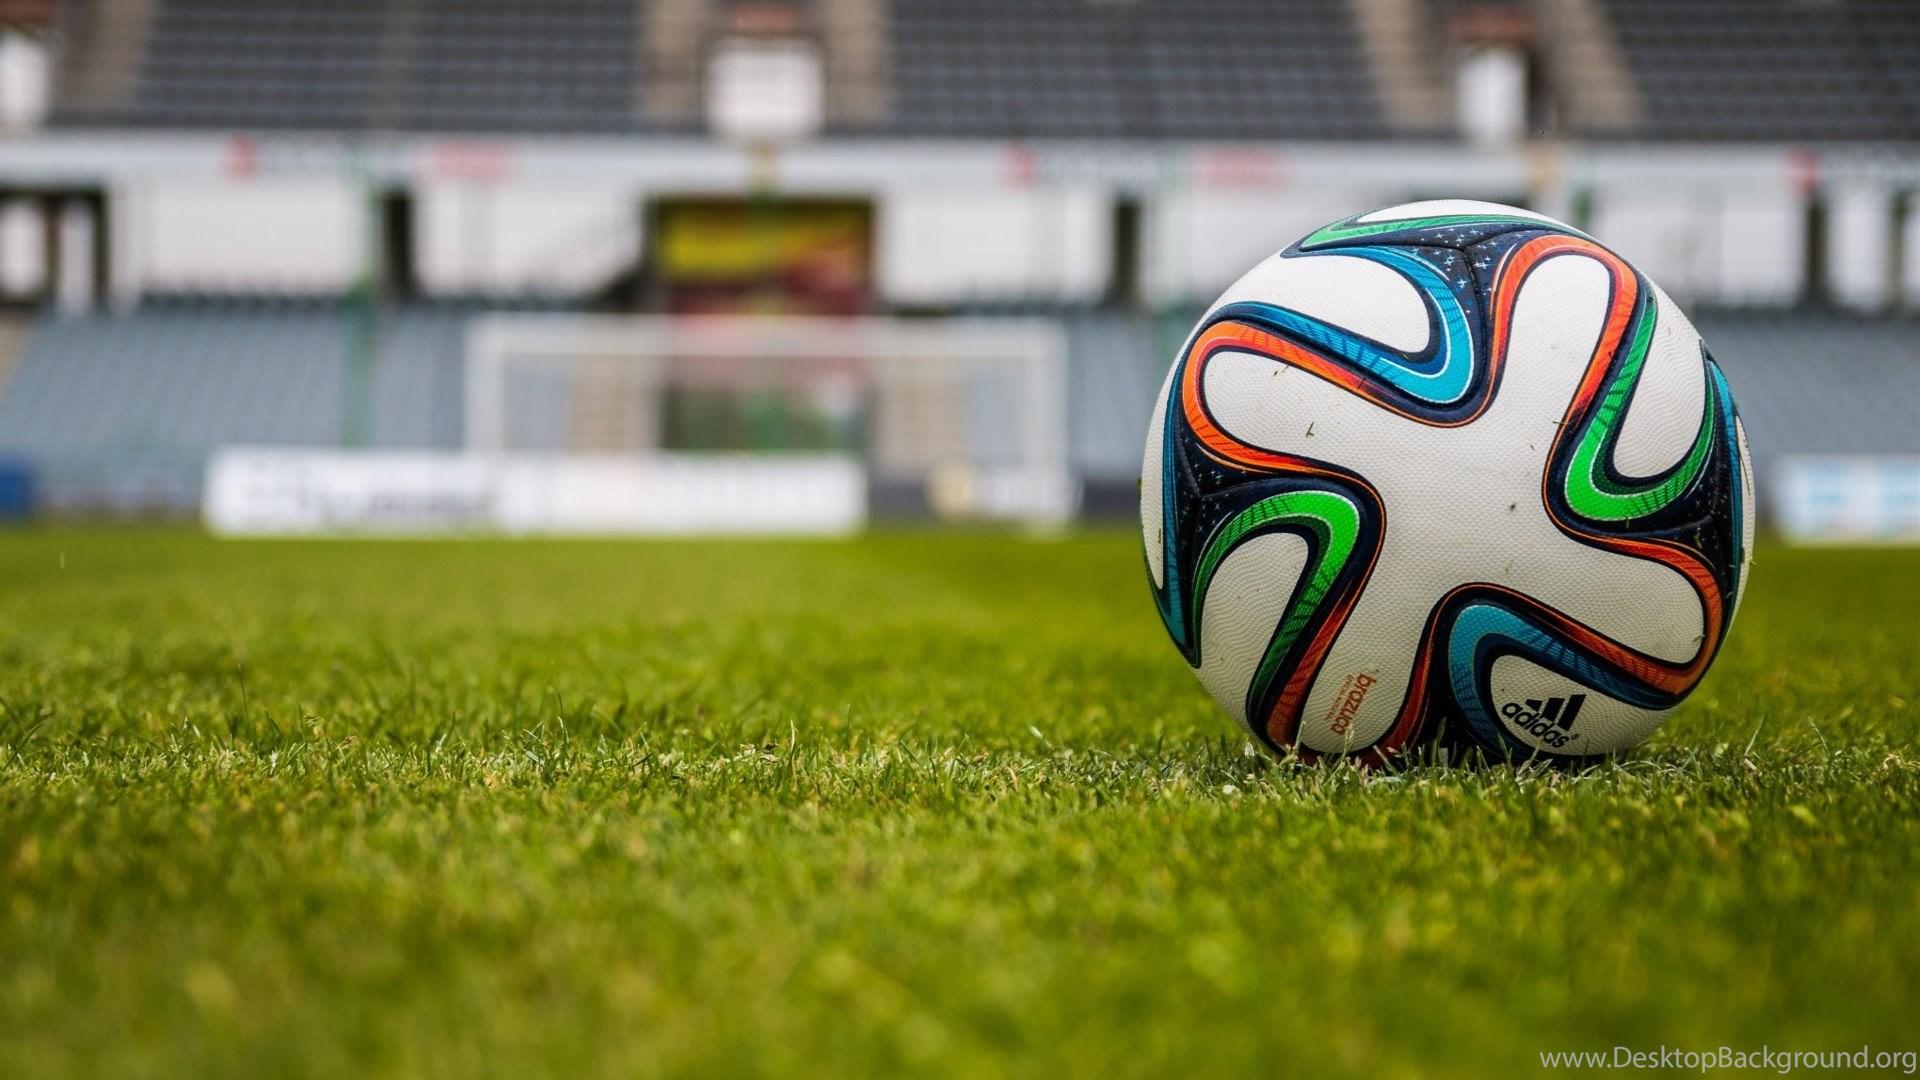 Football Or Soccer Balls Hd Wallpapers 4k Wallpapers Desktop Background